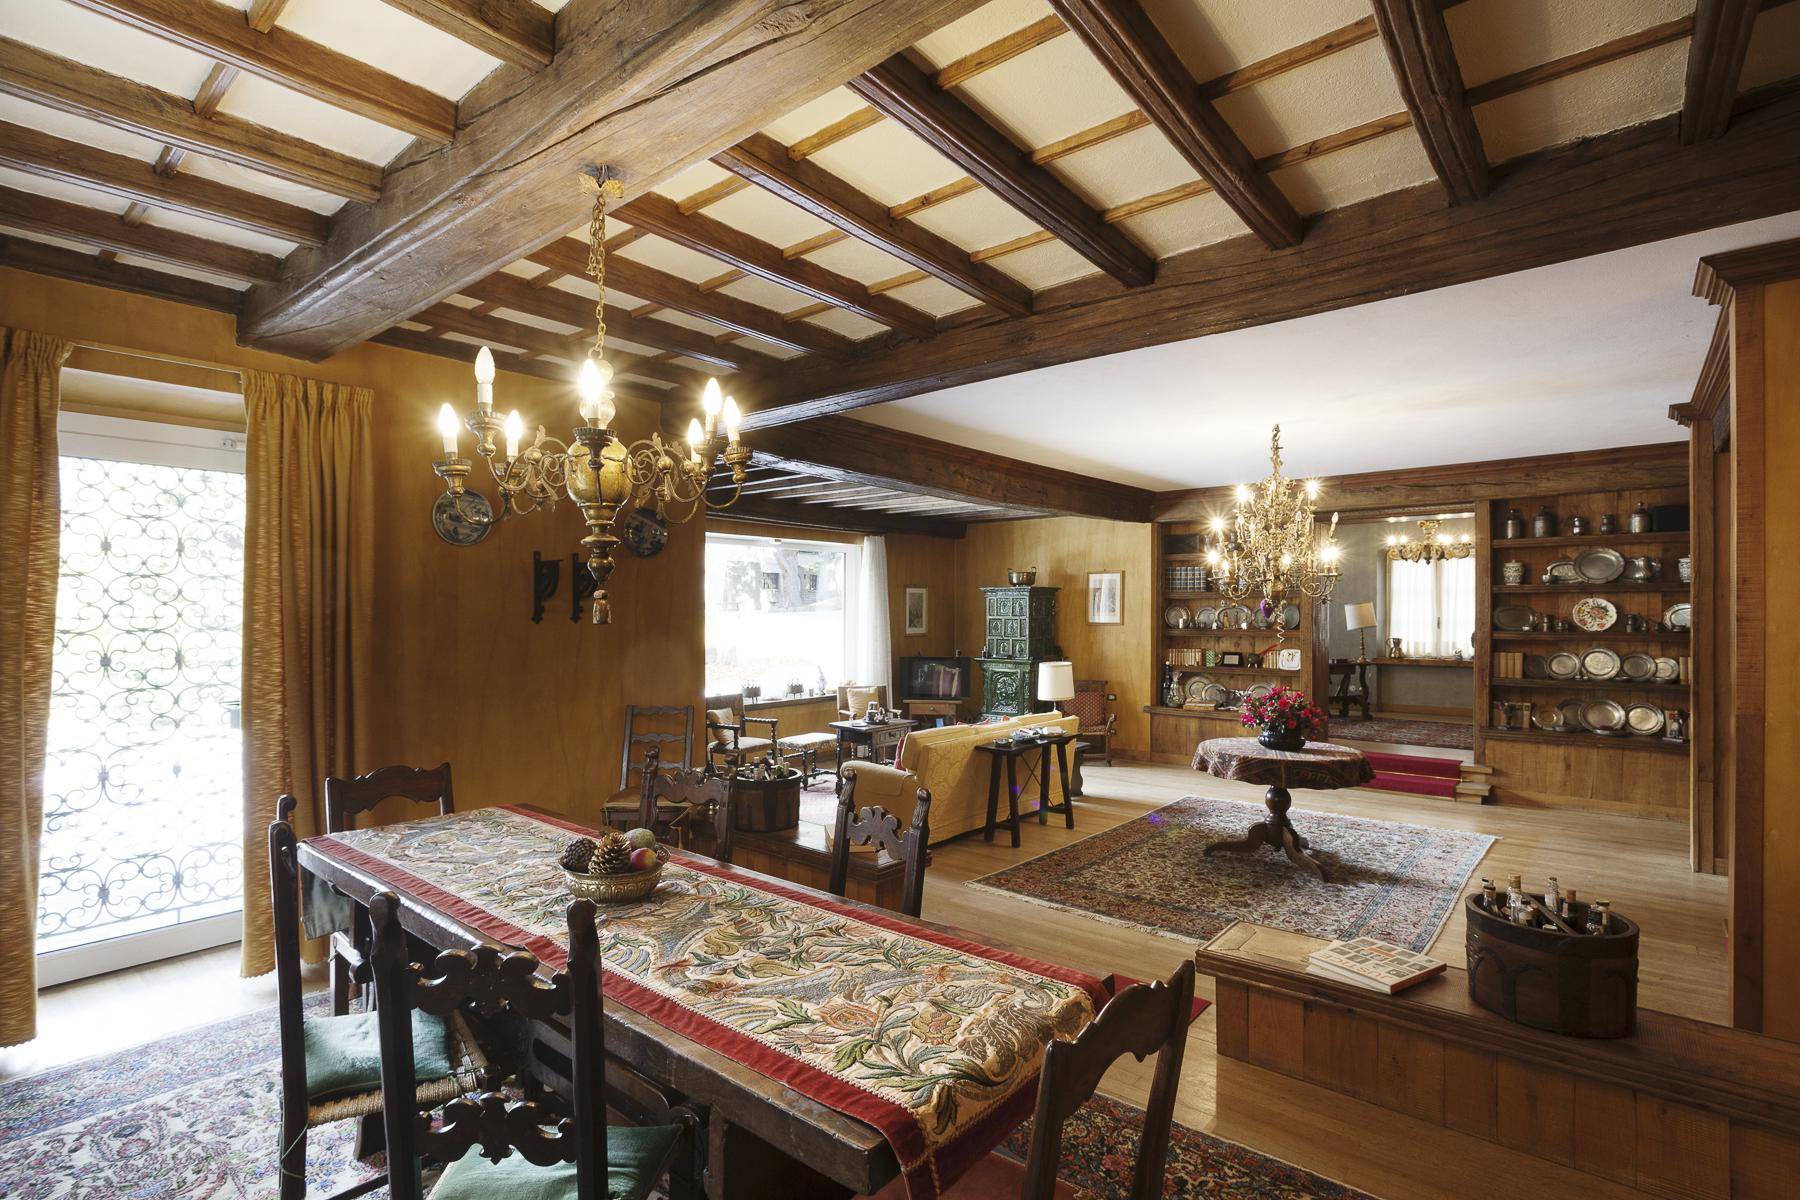 Villa in Vendita a Courmayeur: 5 locali, 900 mq - Foto 5